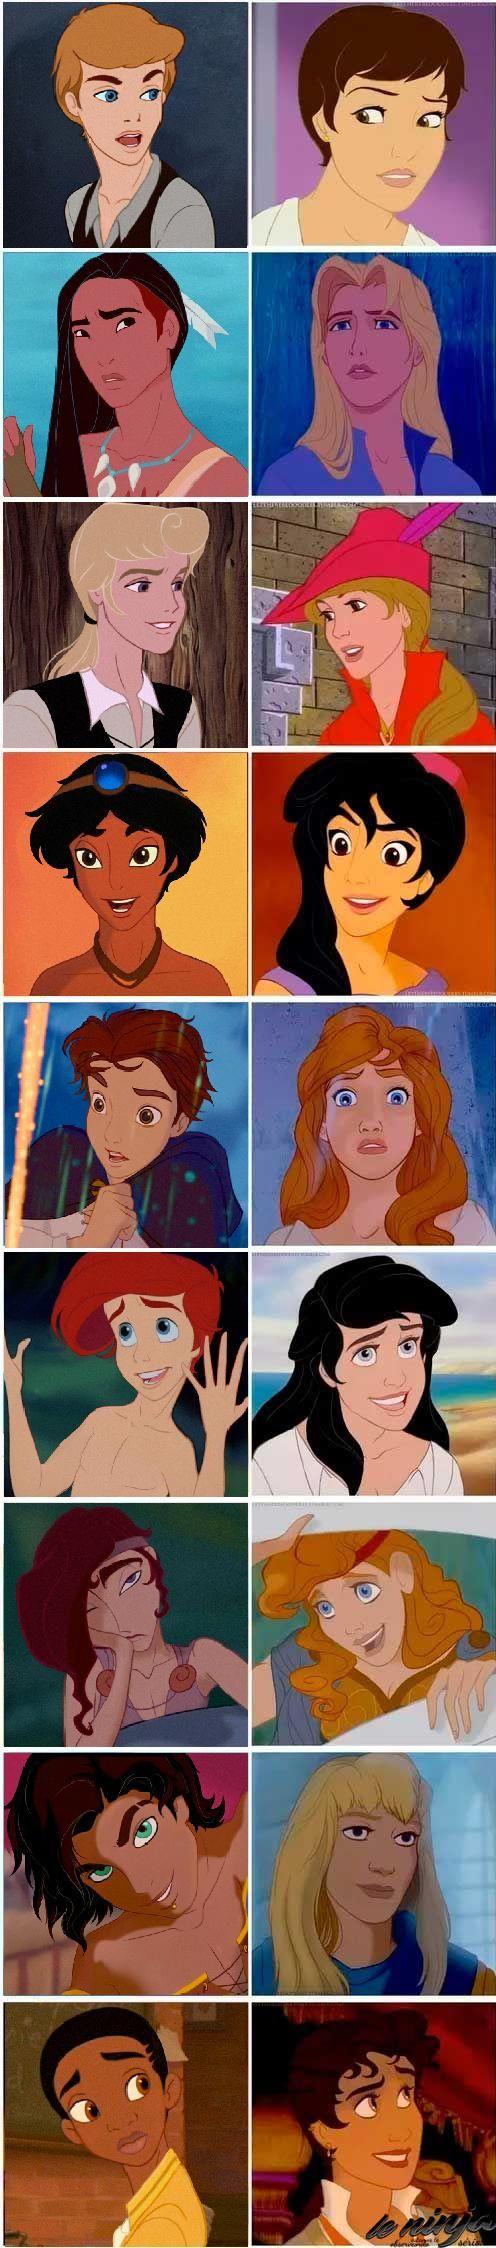 Disney Prince/Princess genderbend.